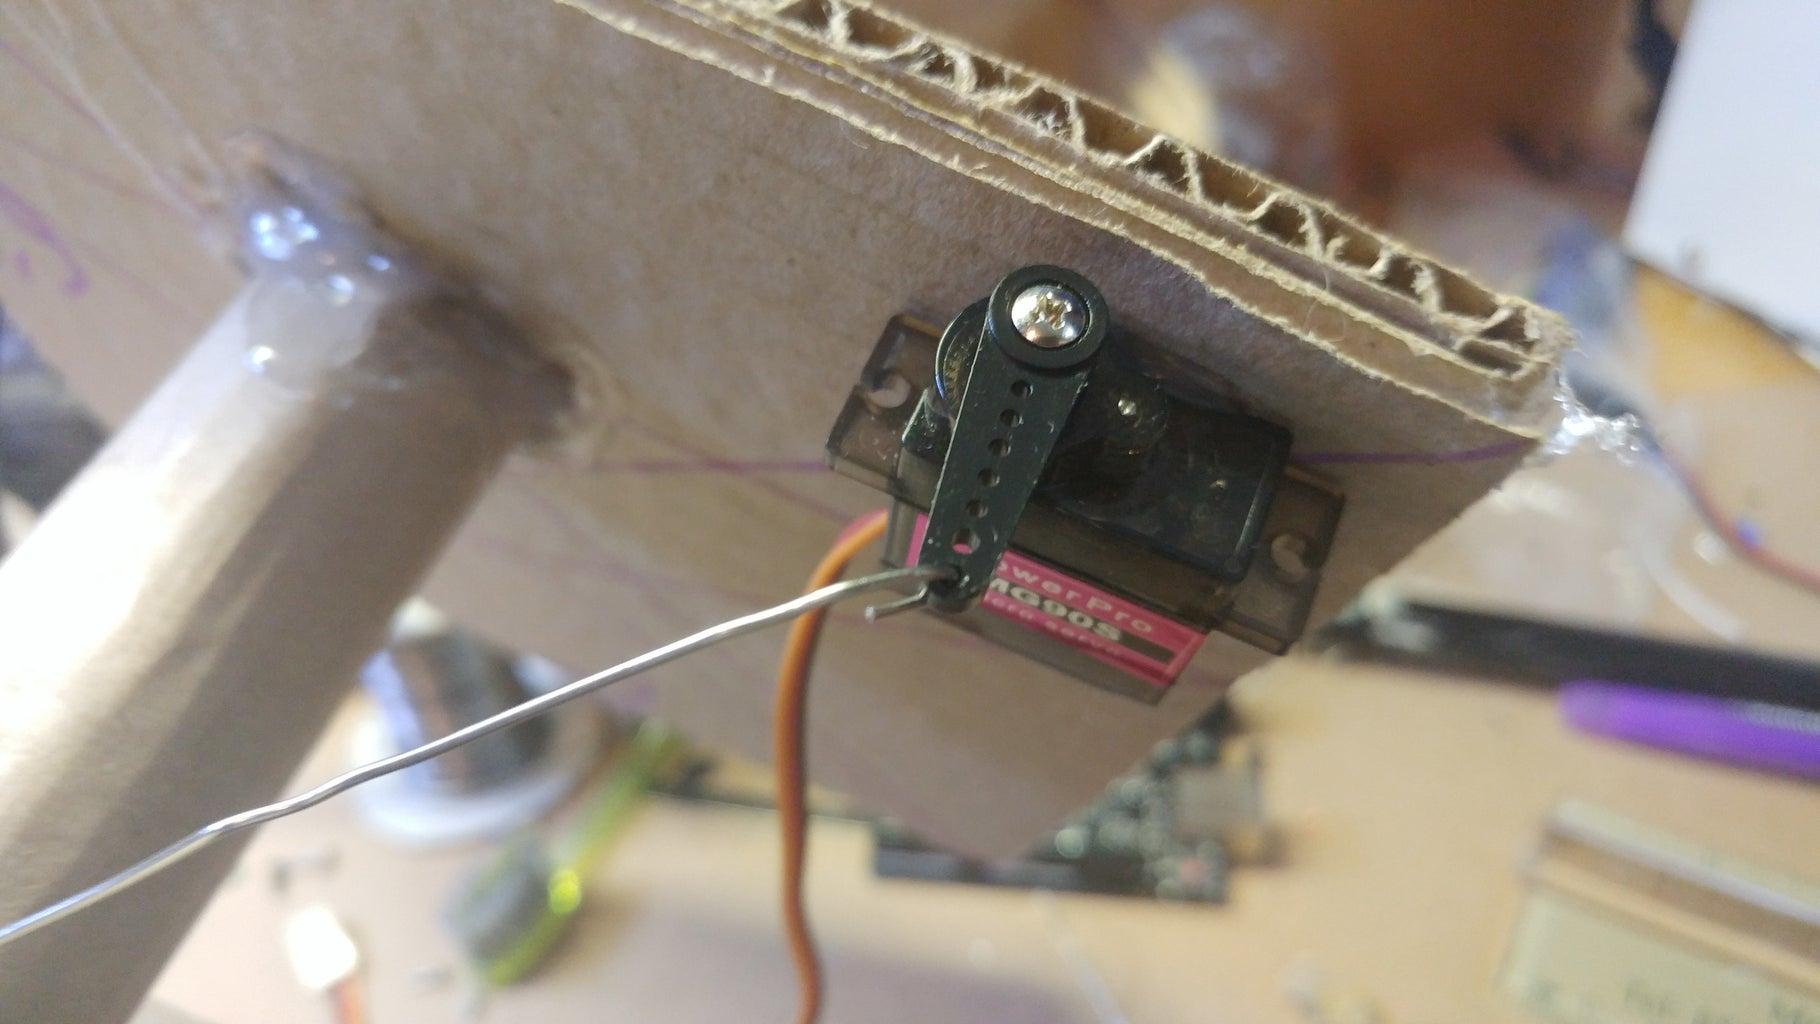 Rotation 1: Hardware